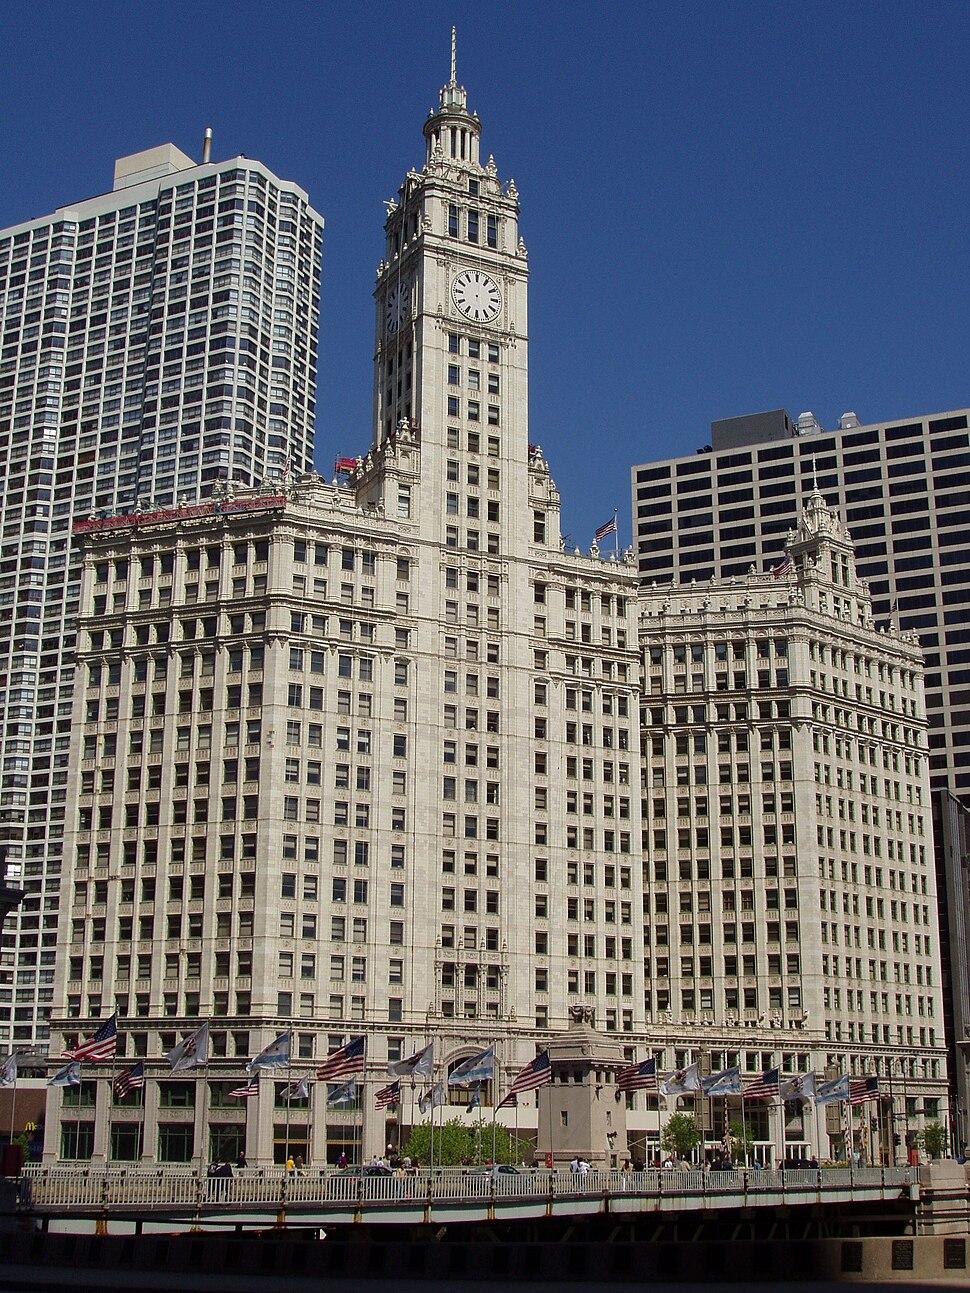 Wrigley Building - Chicago, Illinois